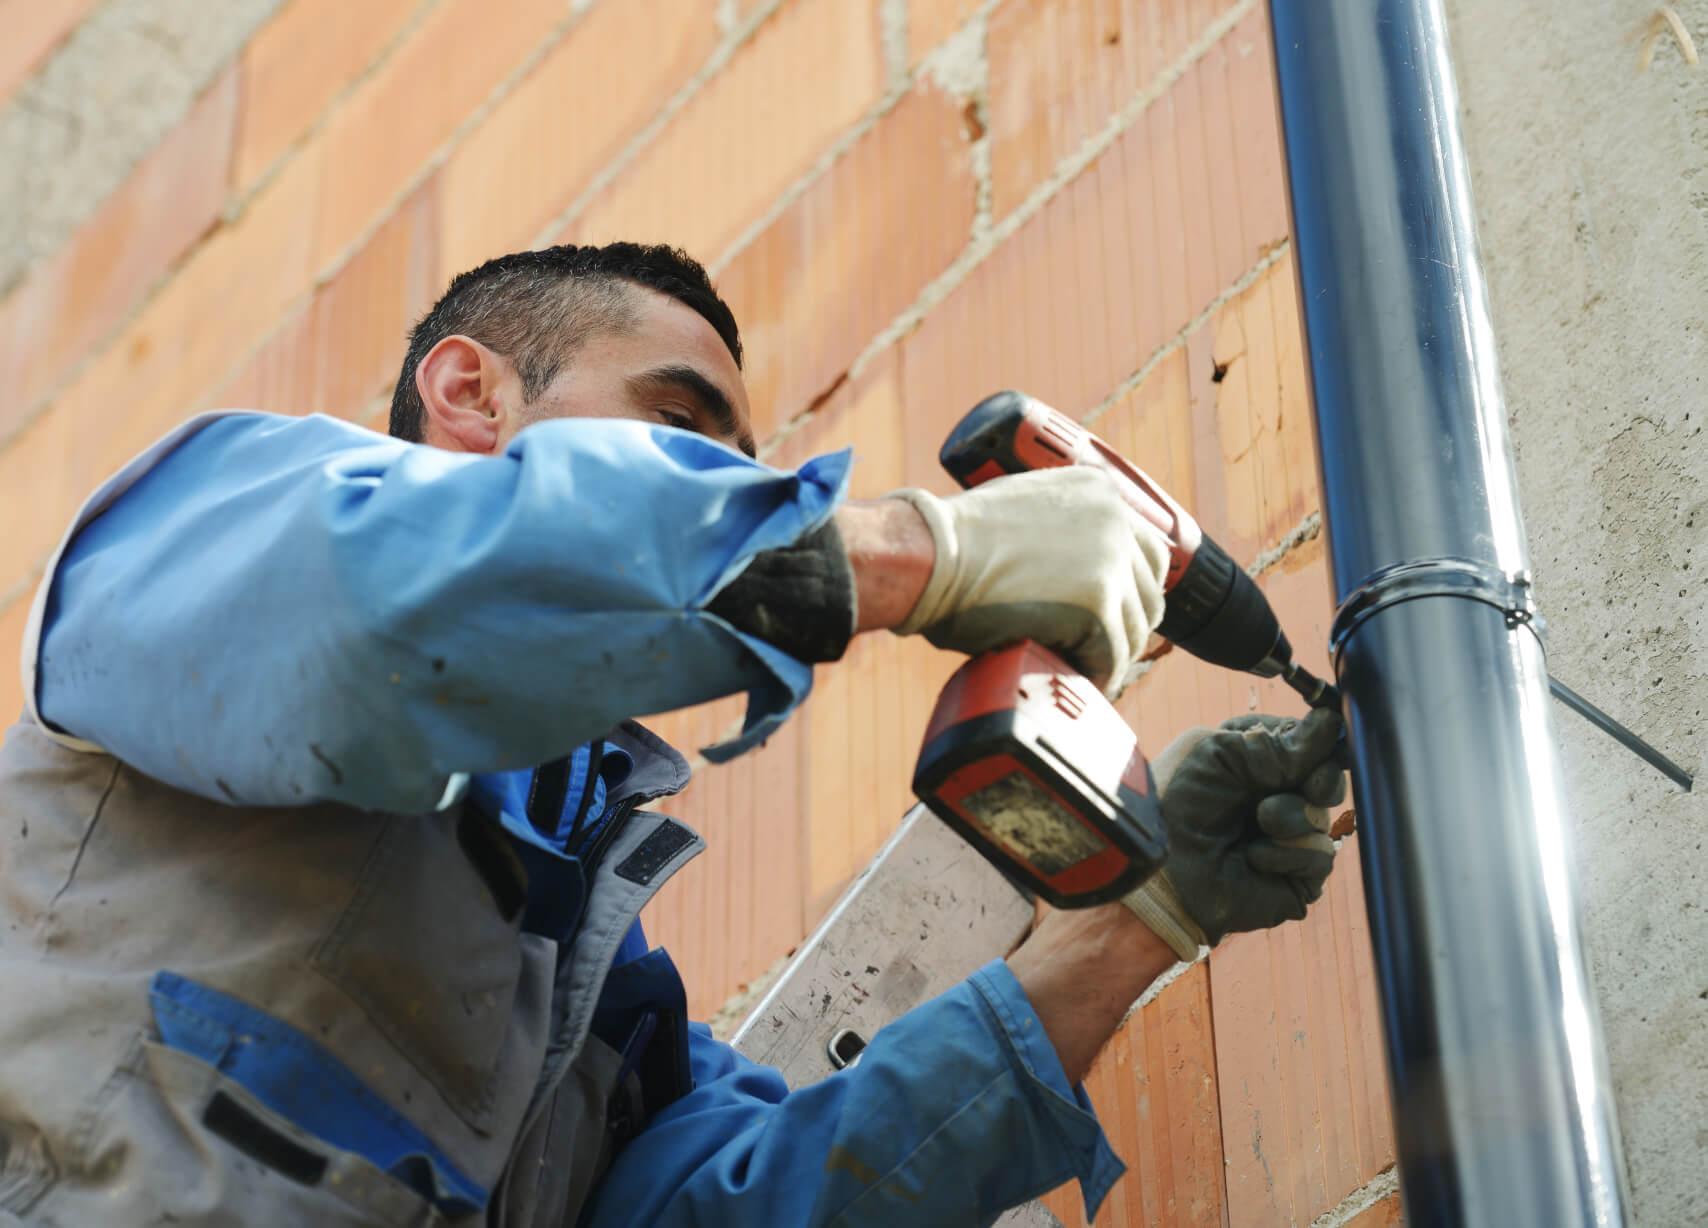 Facility Maintenance on Ladder